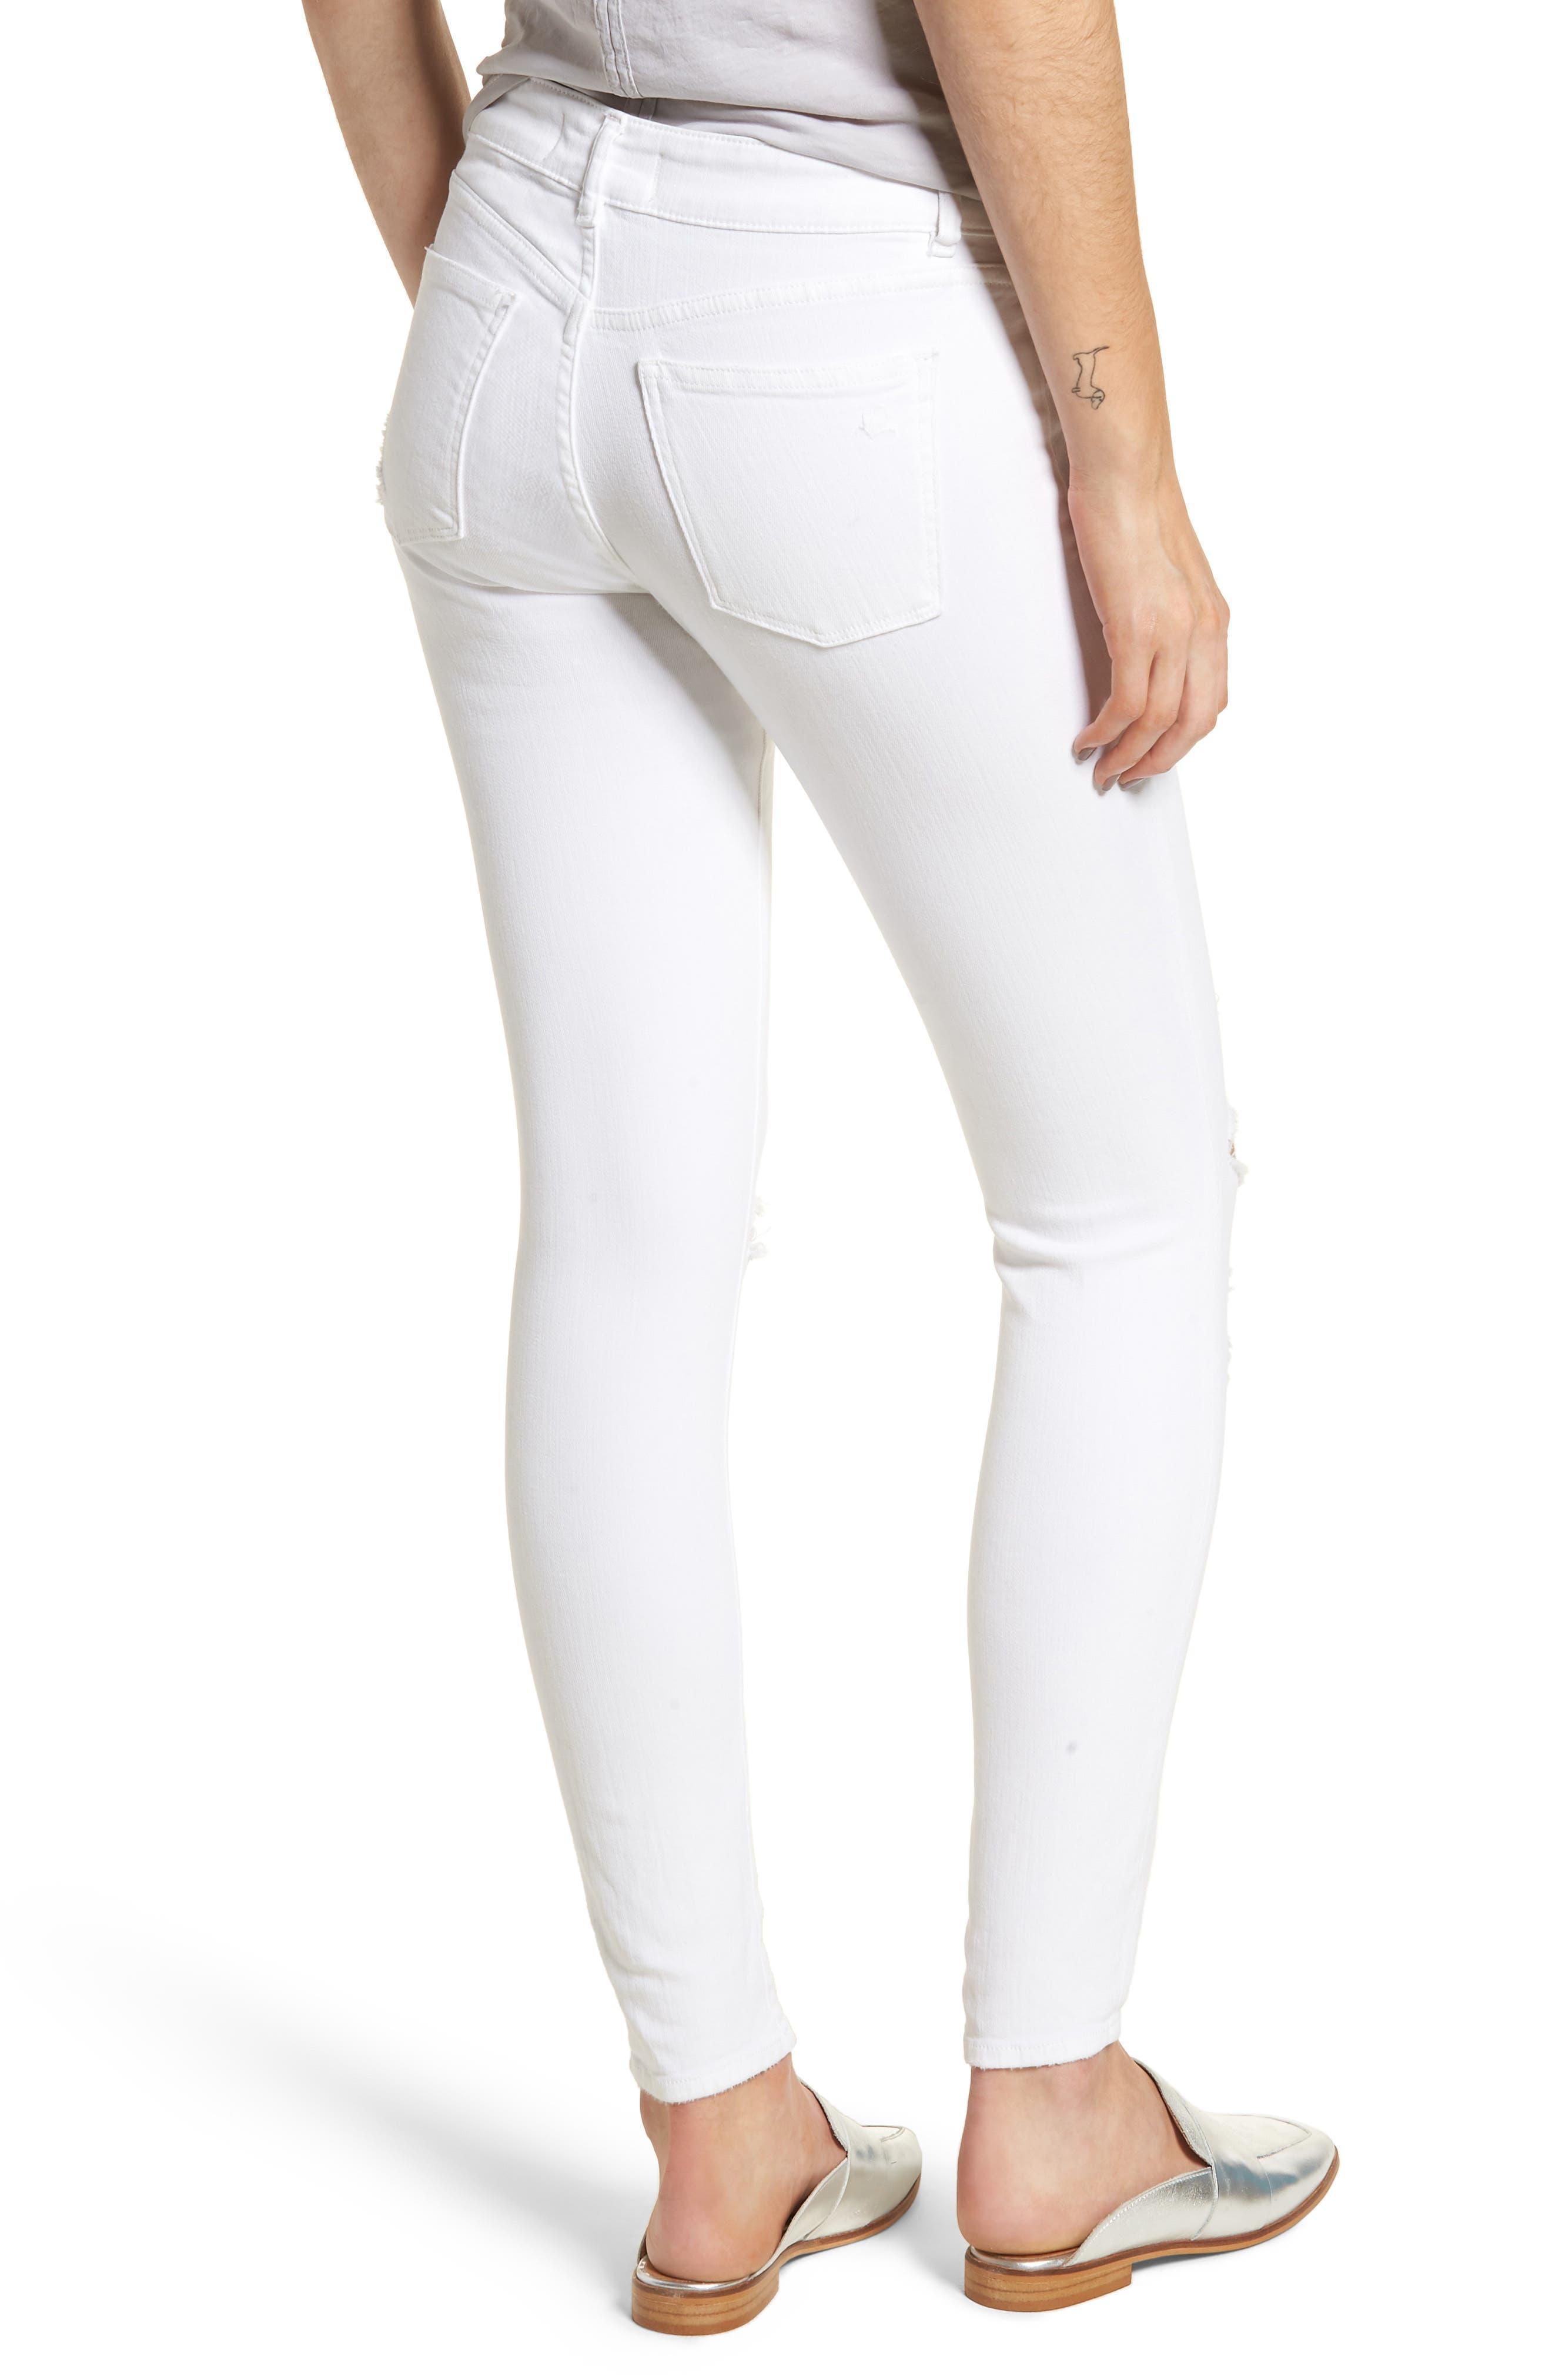 Emma Power Legging Jeans,                             Alternate thumbnail 2, color,                             100